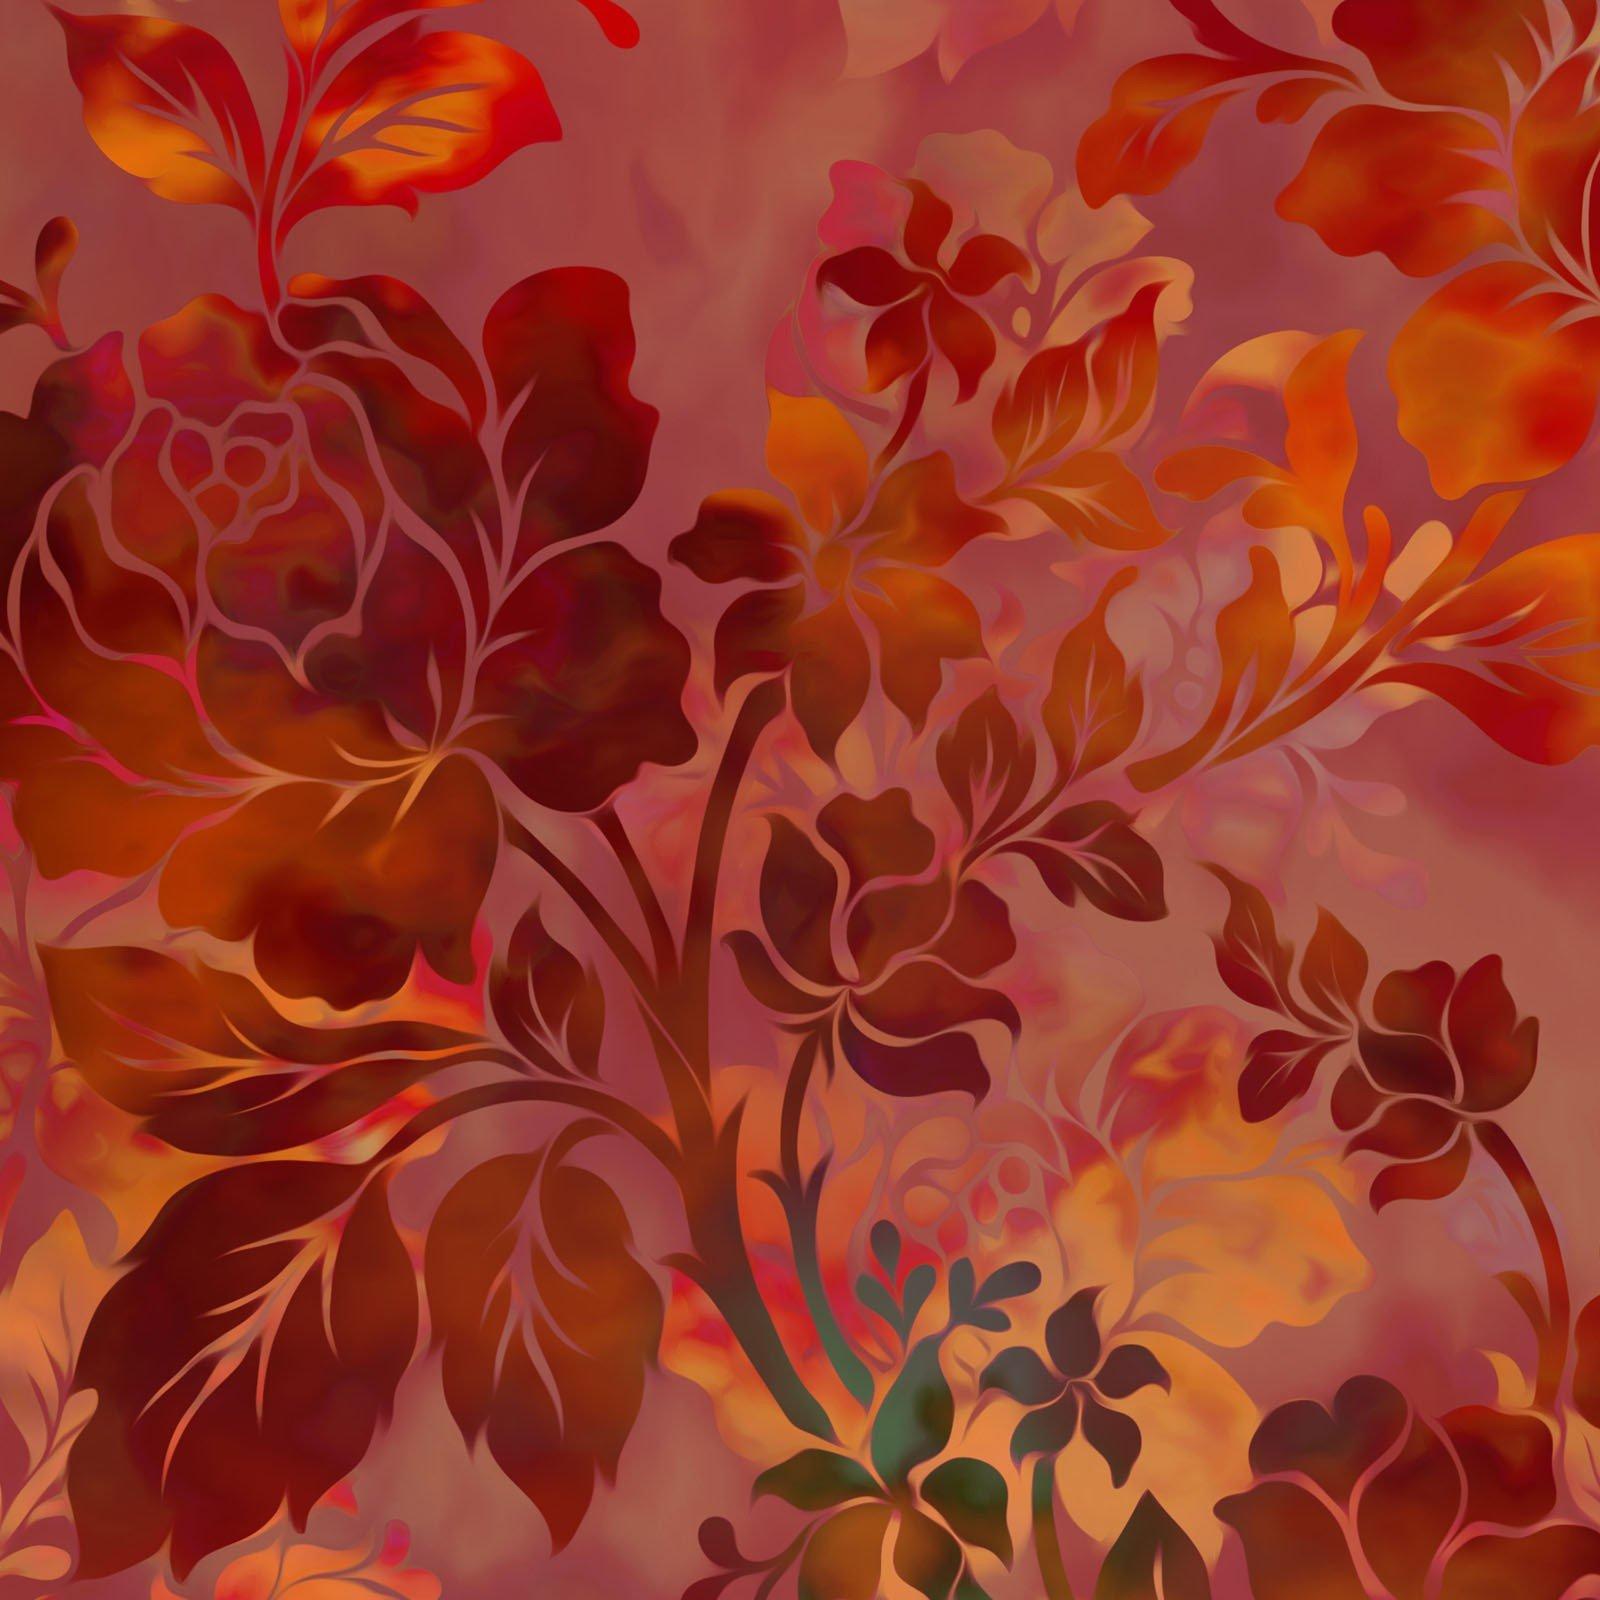 Diaphanous 1ENC-1 Spice Night Bloom